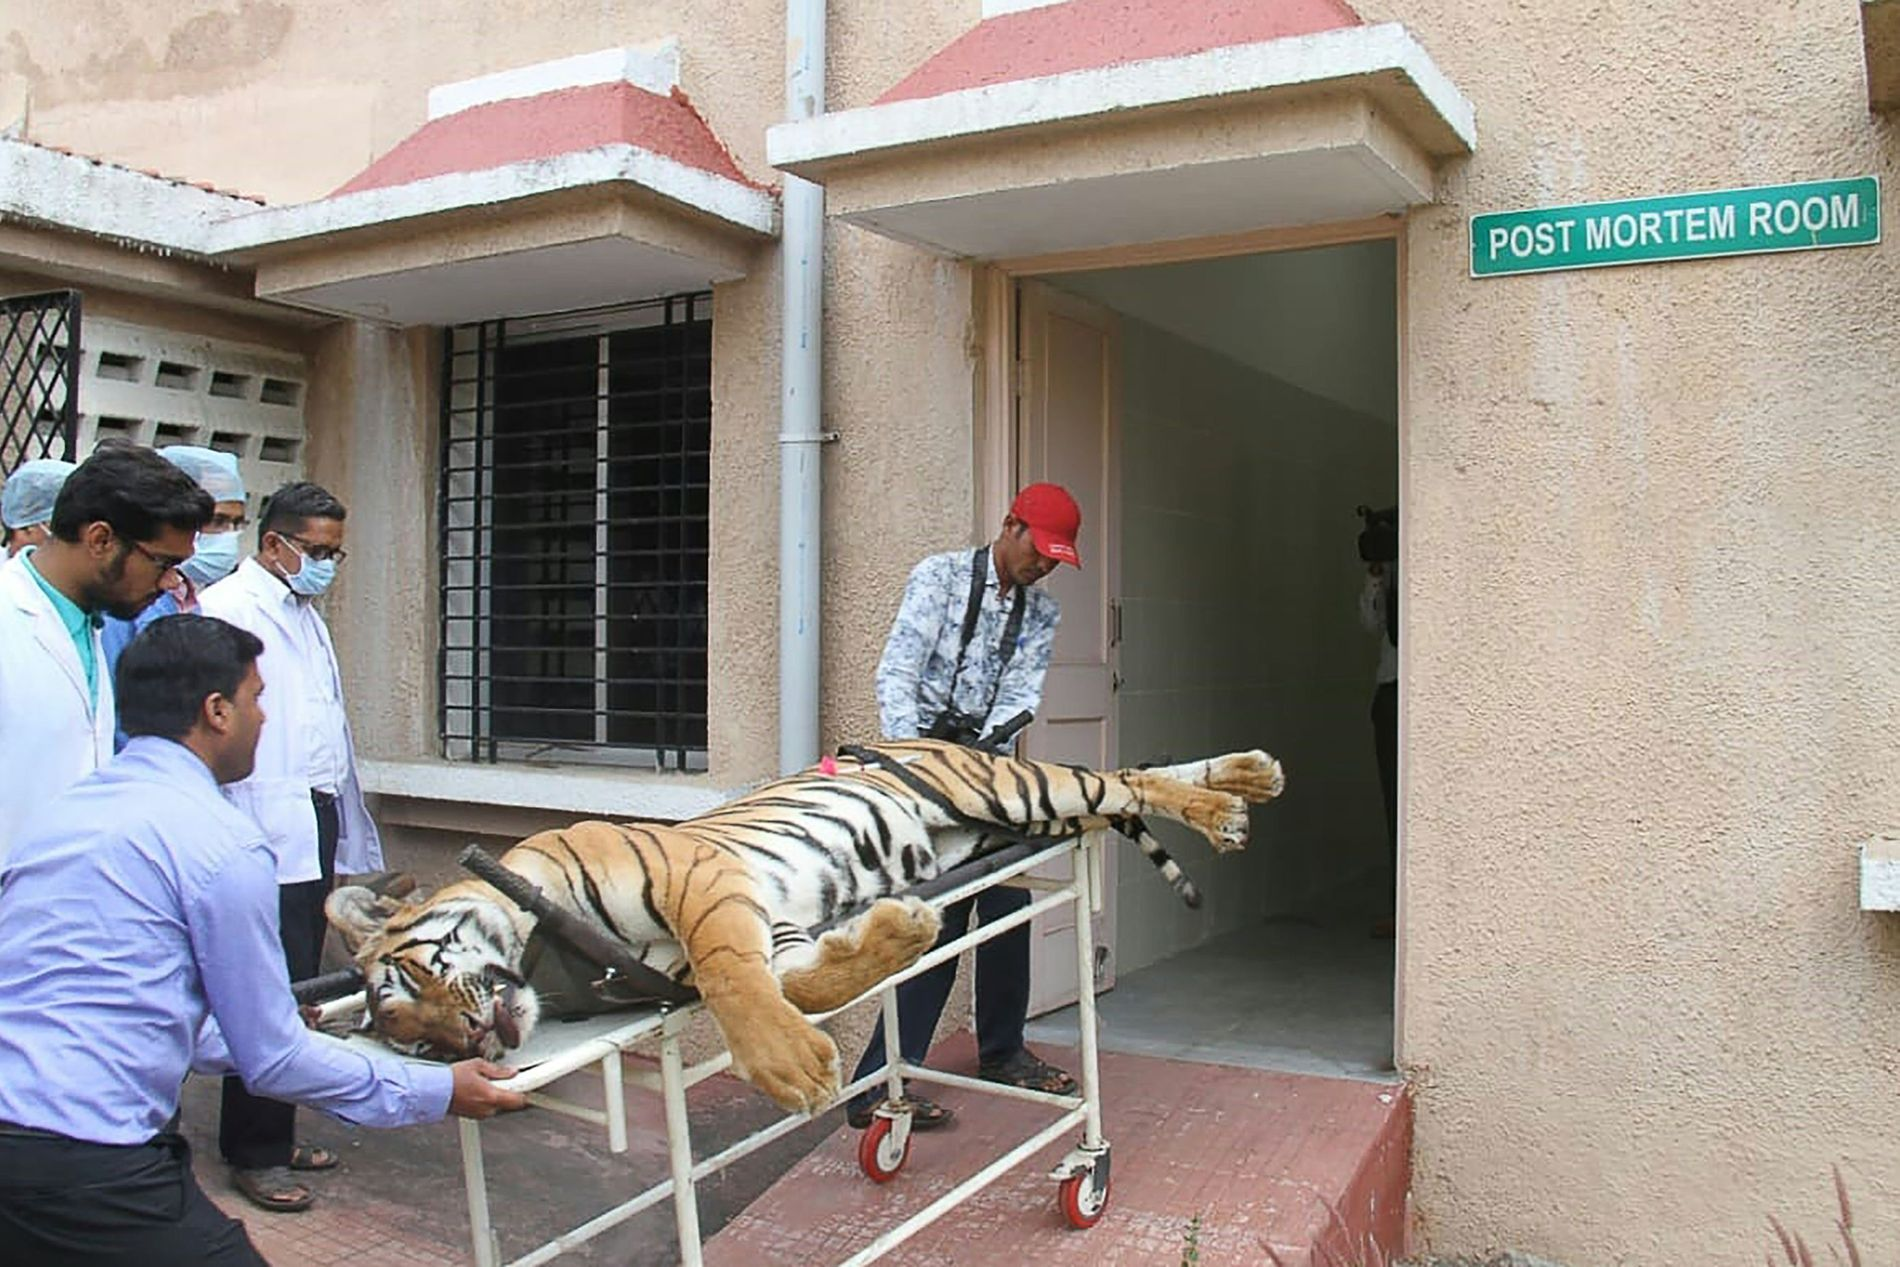 DREPT: Mens landsbybeboerne jublet over dødsfallet, skal dyreaktivister ha kalt skytingen for ulovlig og uetisk.